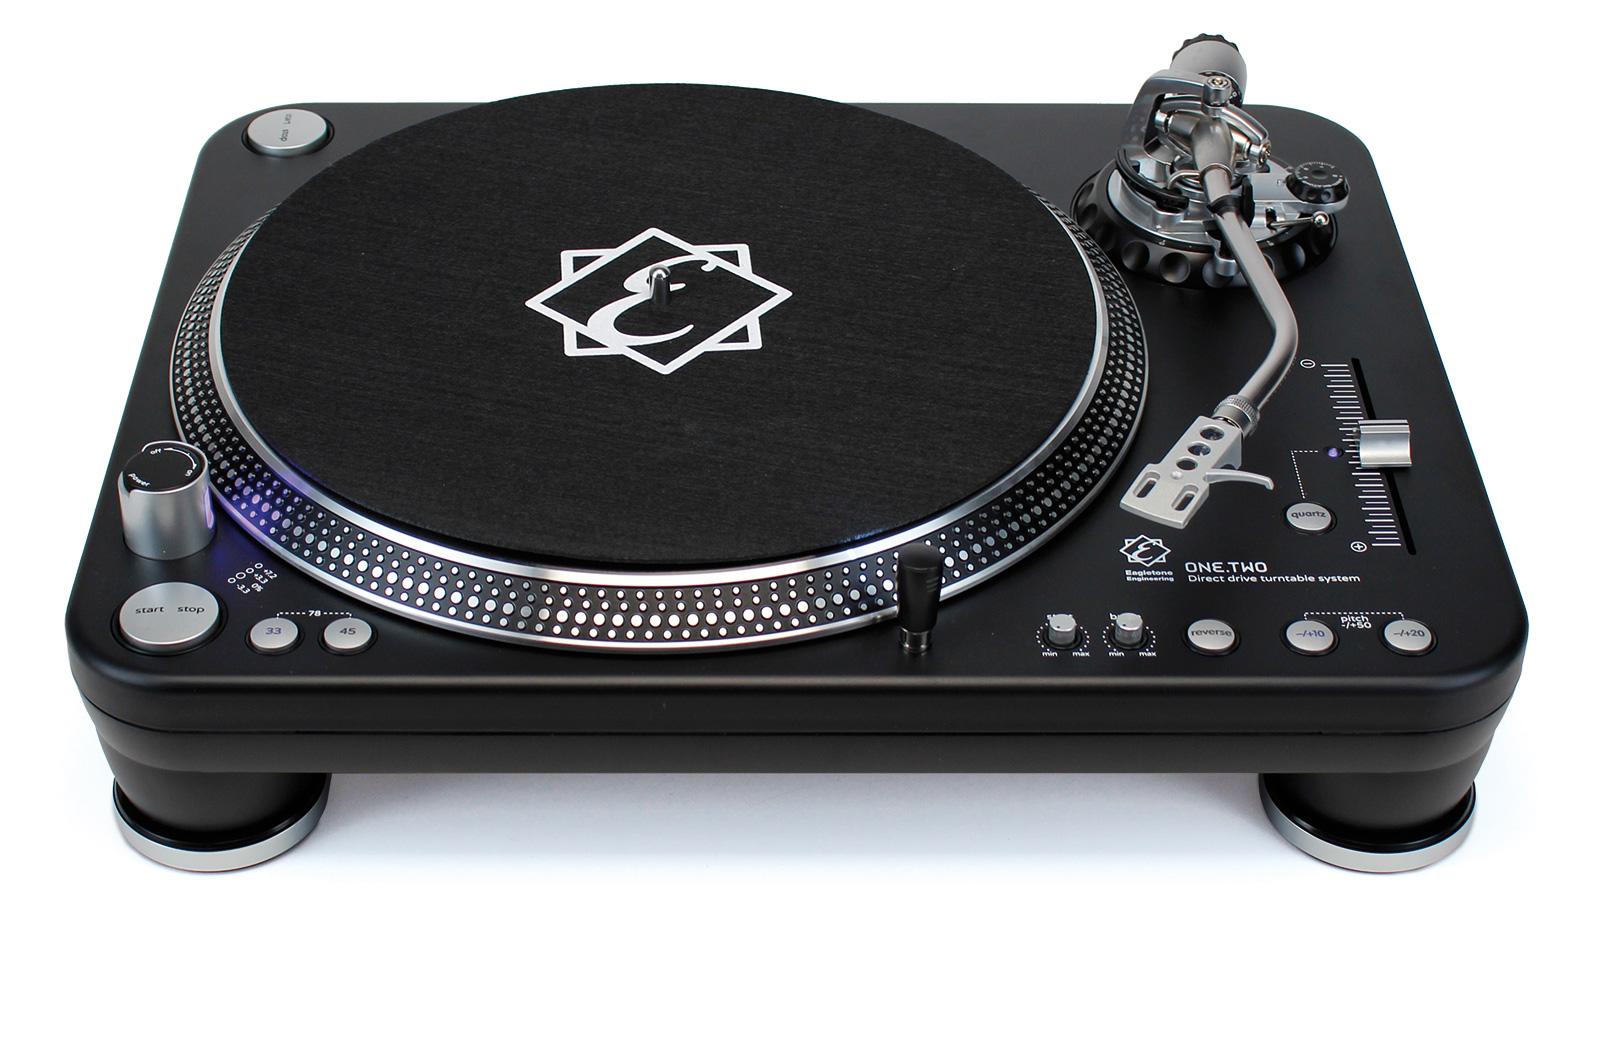 woodbrass lance la platine vinyle usb pour dj eagletone onetwo audiofanzine. Black Bedroom Furniture Sets. Home Design Ideas